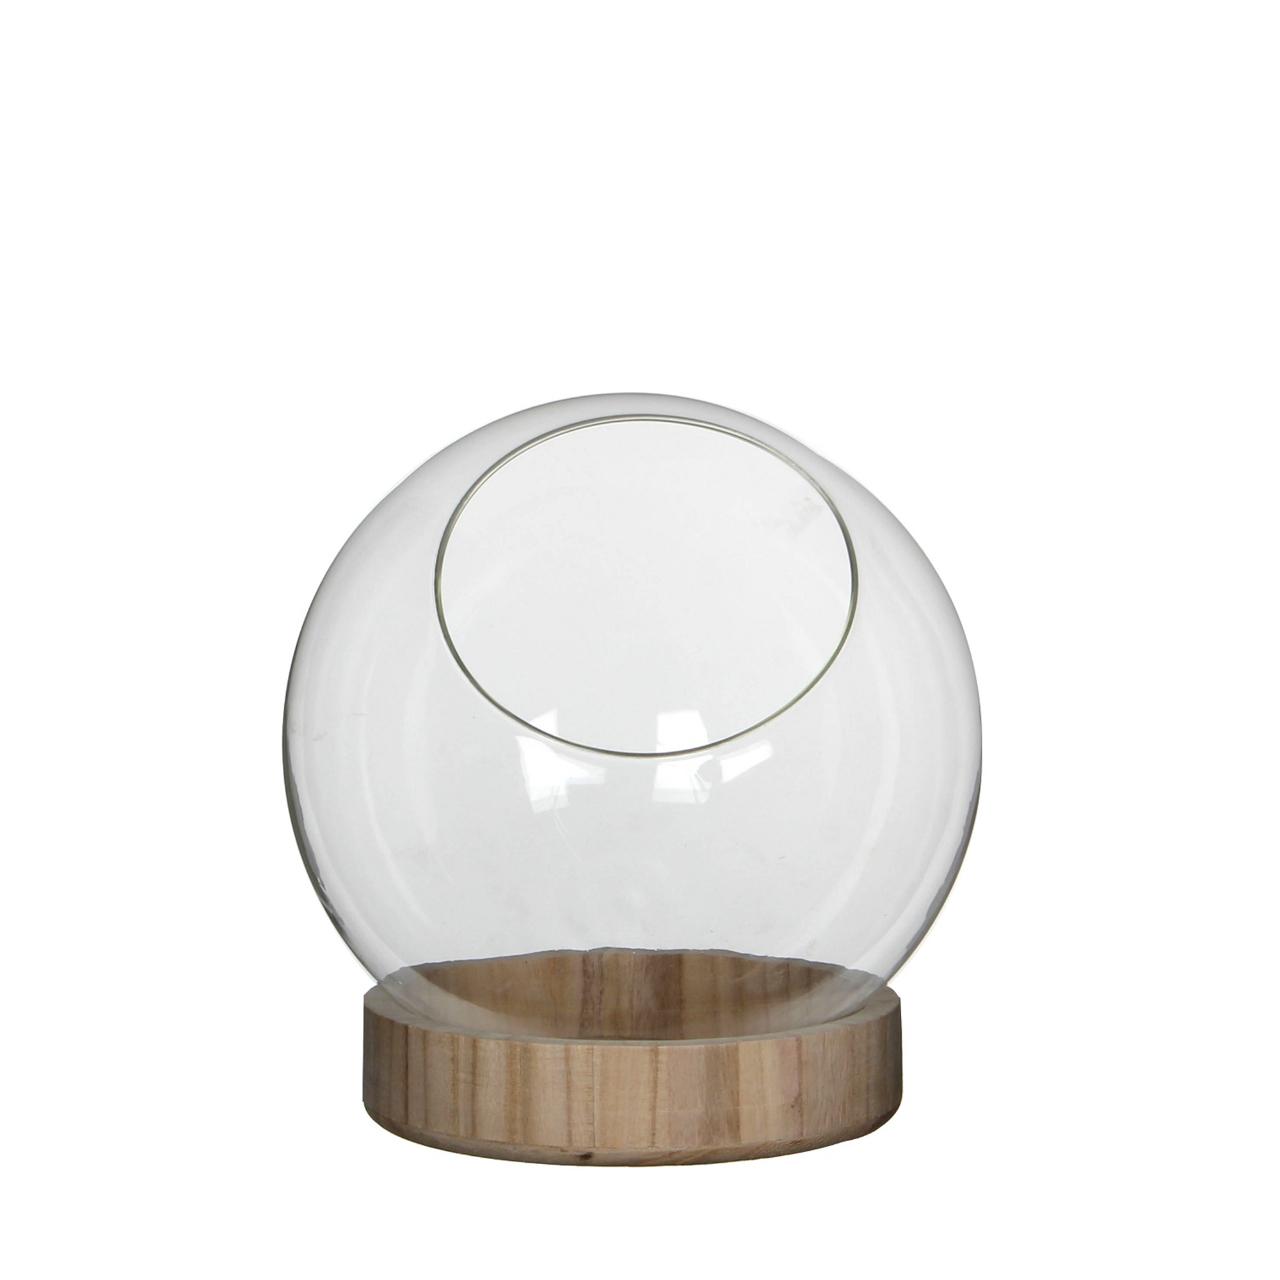 Manhattan Bowl on dish | alvaluz.com